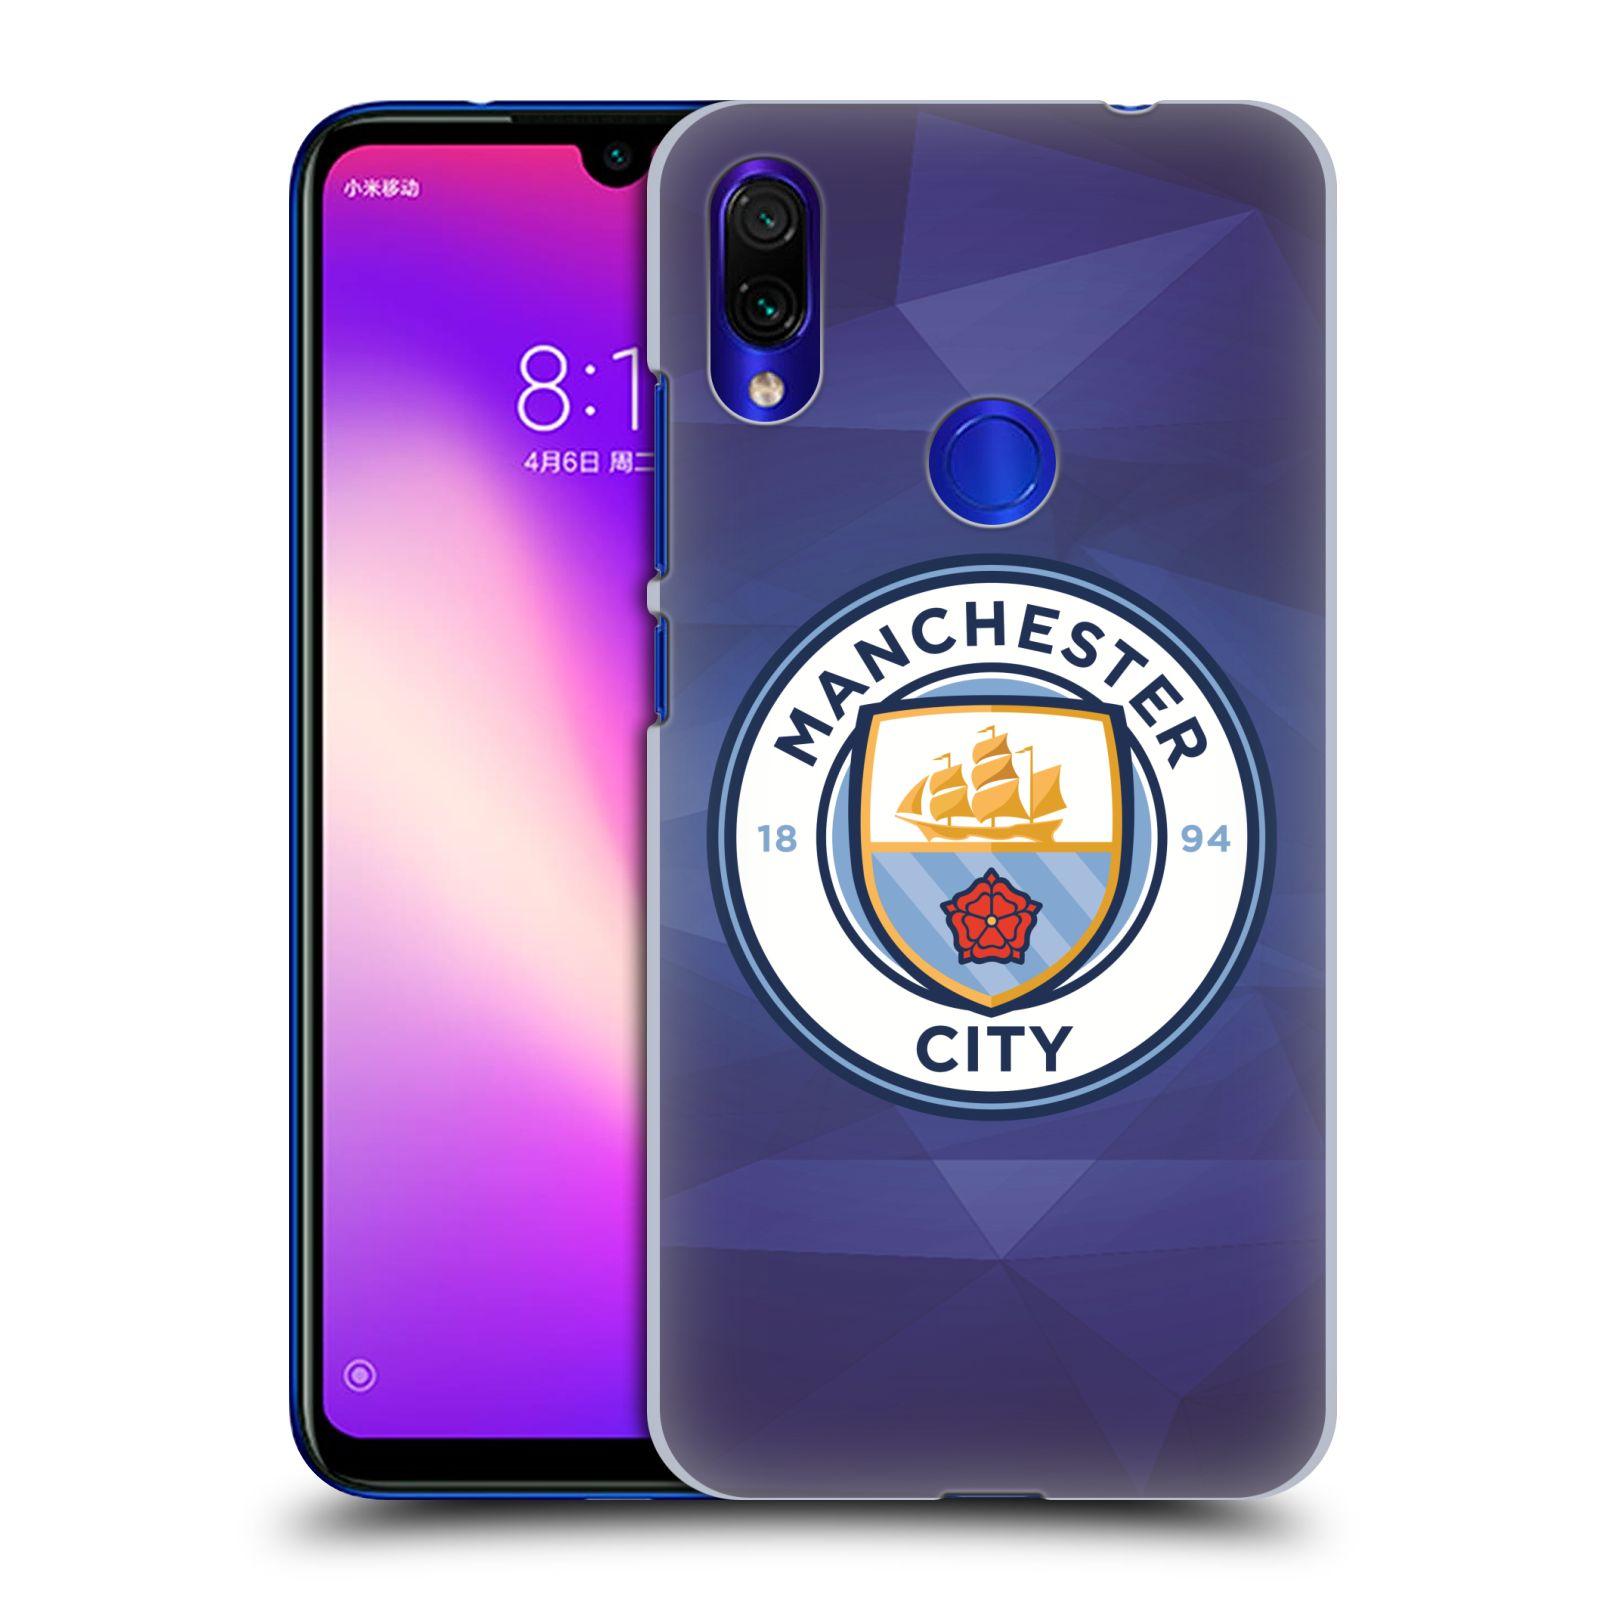 Plastové pouzdro na mobil Xiaomi Redmi Note 7 - Head Case - Manchester City FC - Modré nové logo